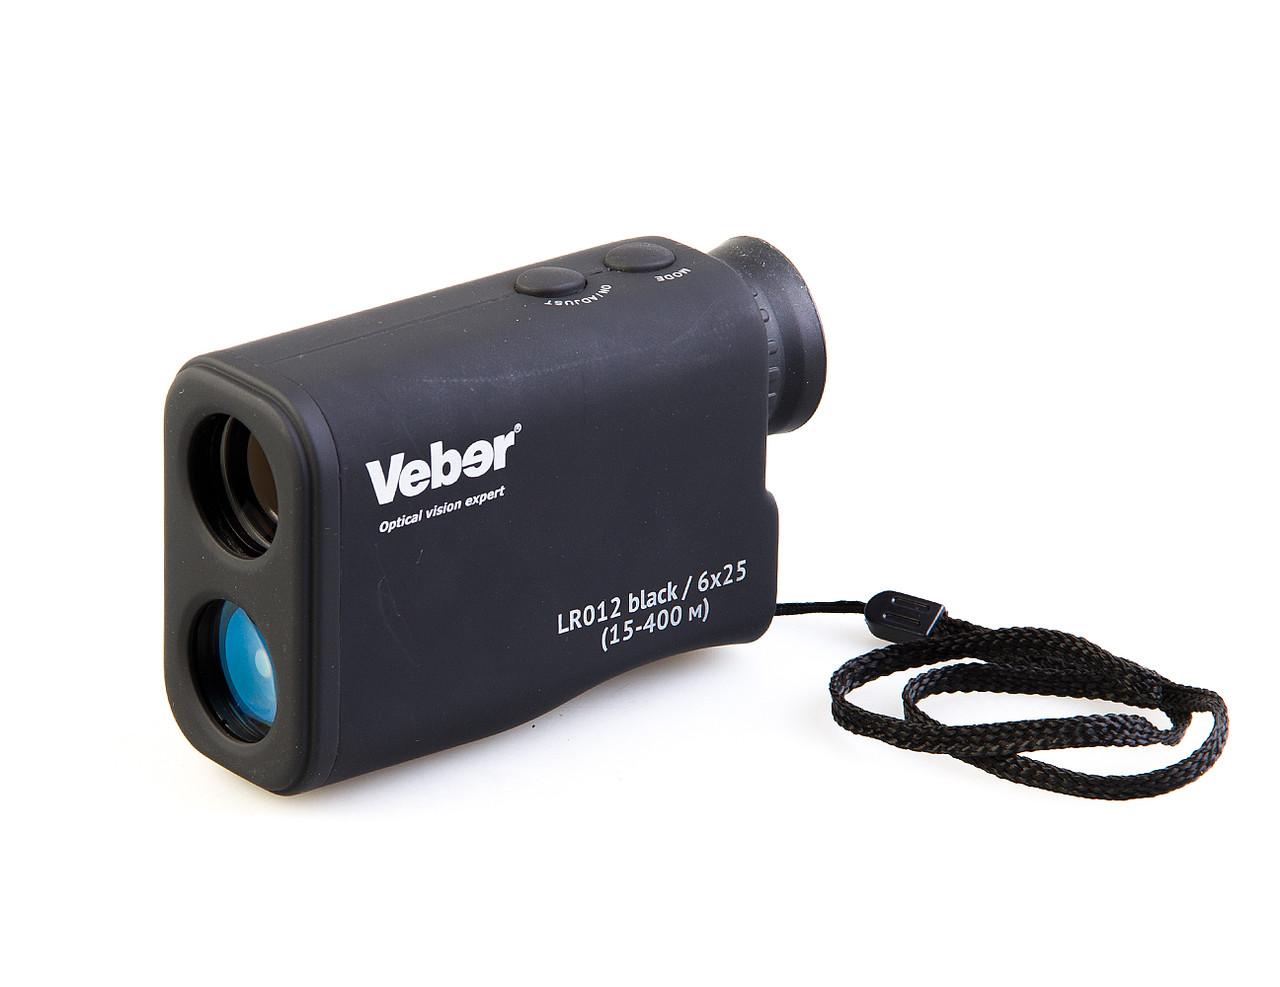 Лазеный дальномер Veber LR012/6*25 black (15-400м)